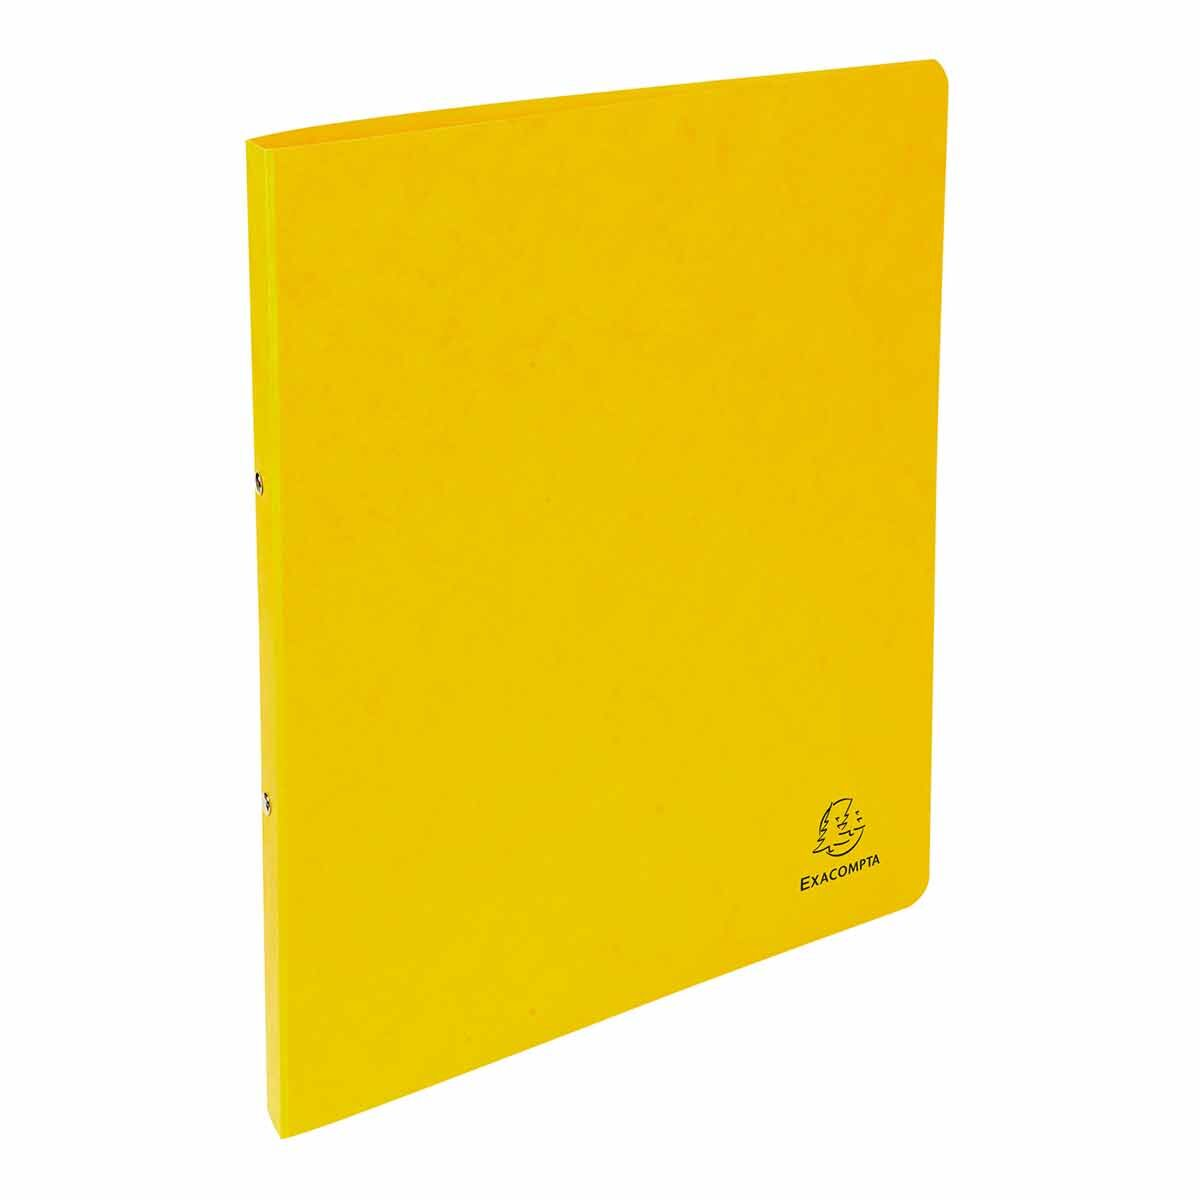 Exacompta Europa Pressboard Ring Binder A4 Pack of 10 Yellow